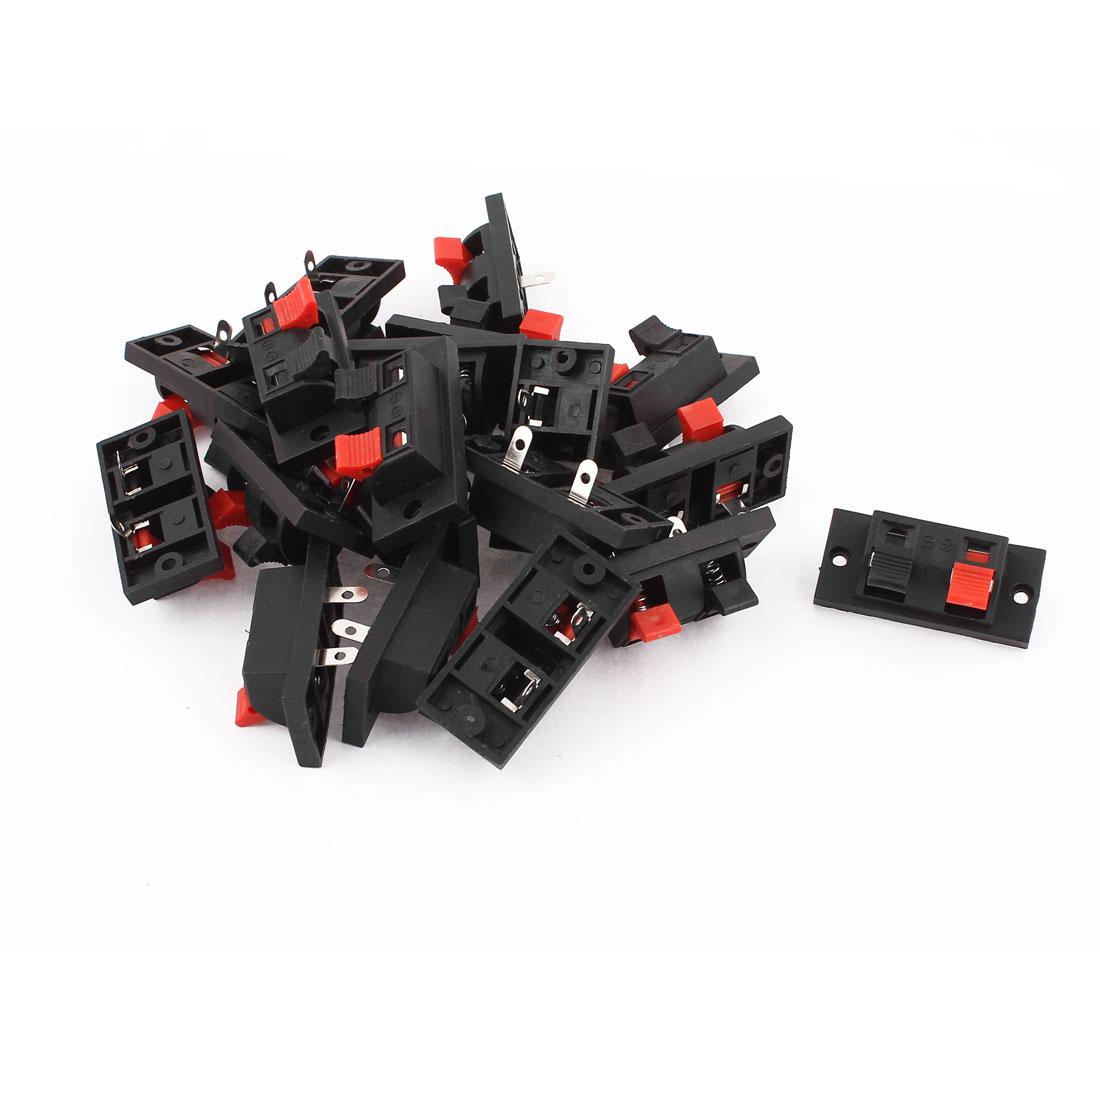 19 Pcs 2 Way Spring Push Release Connector Amplifier Speaker Terminal Strip Block